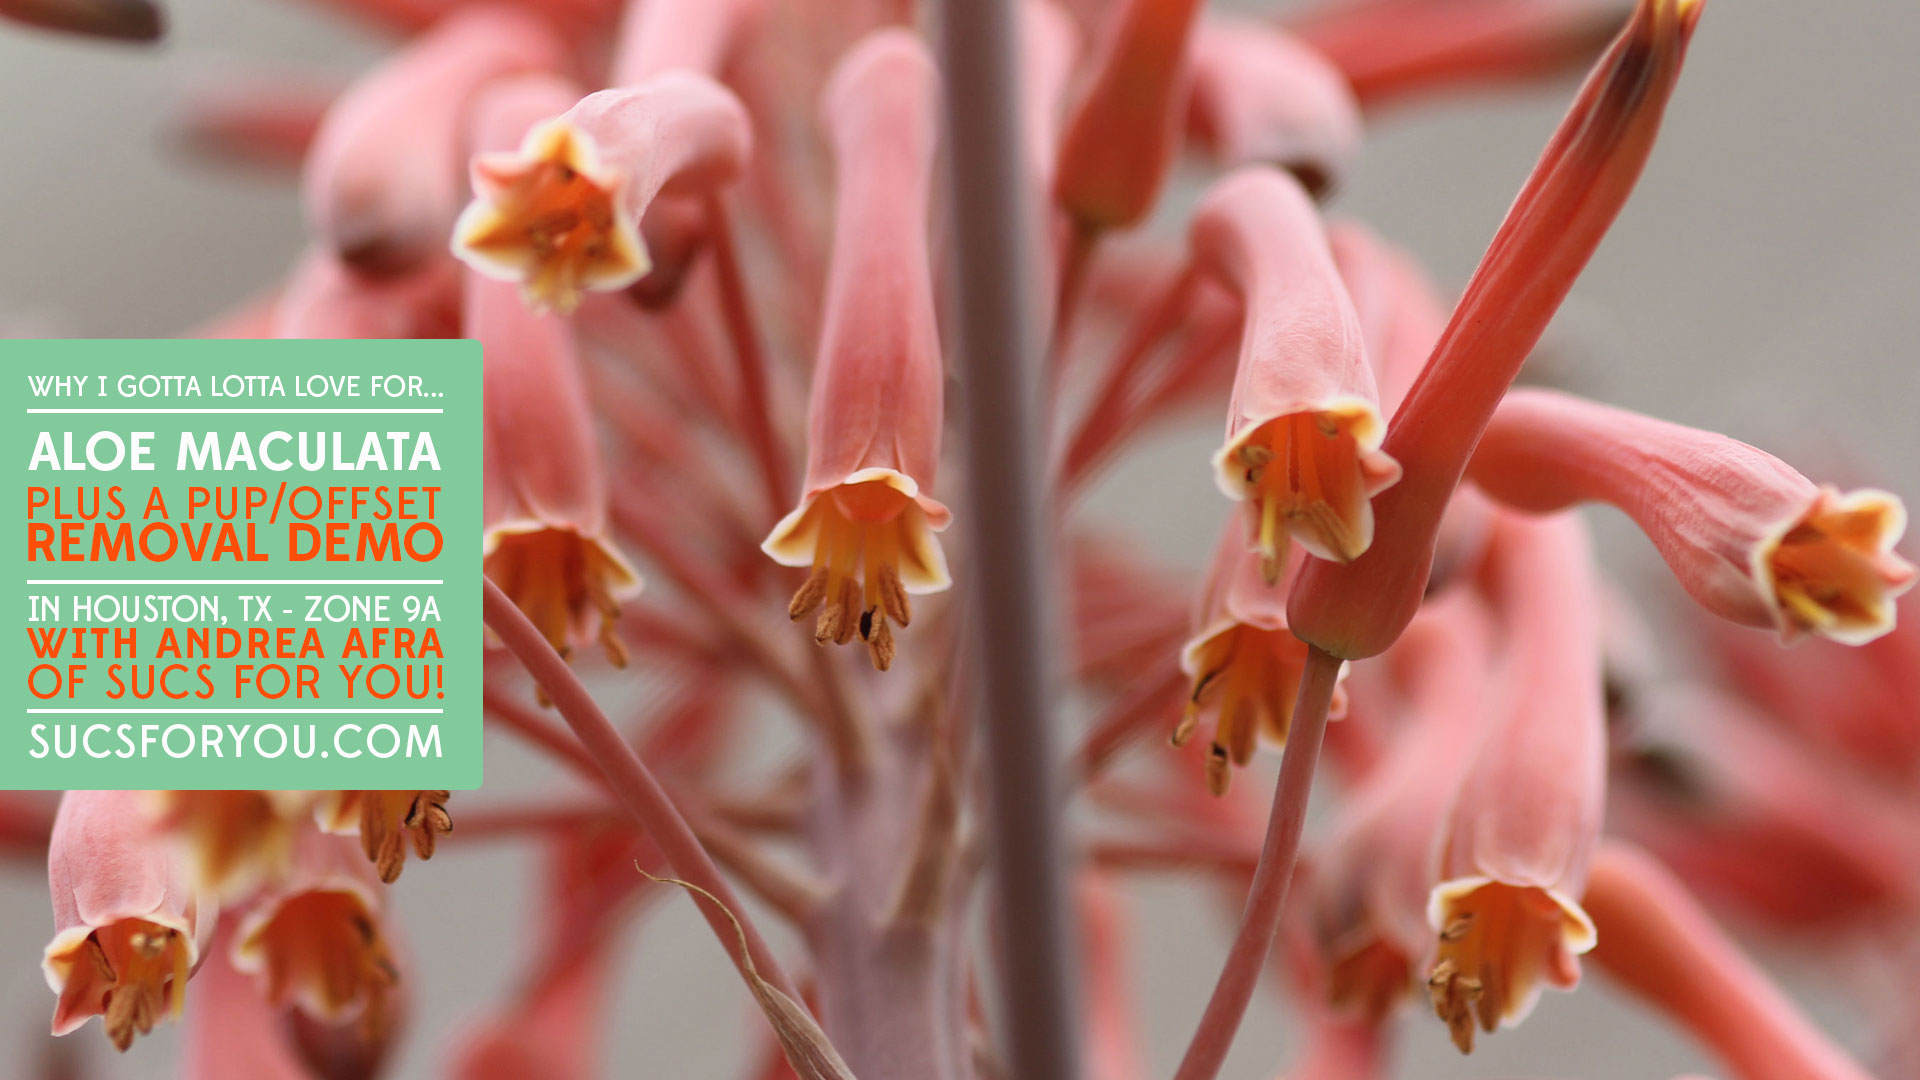 Aloe maculata demo